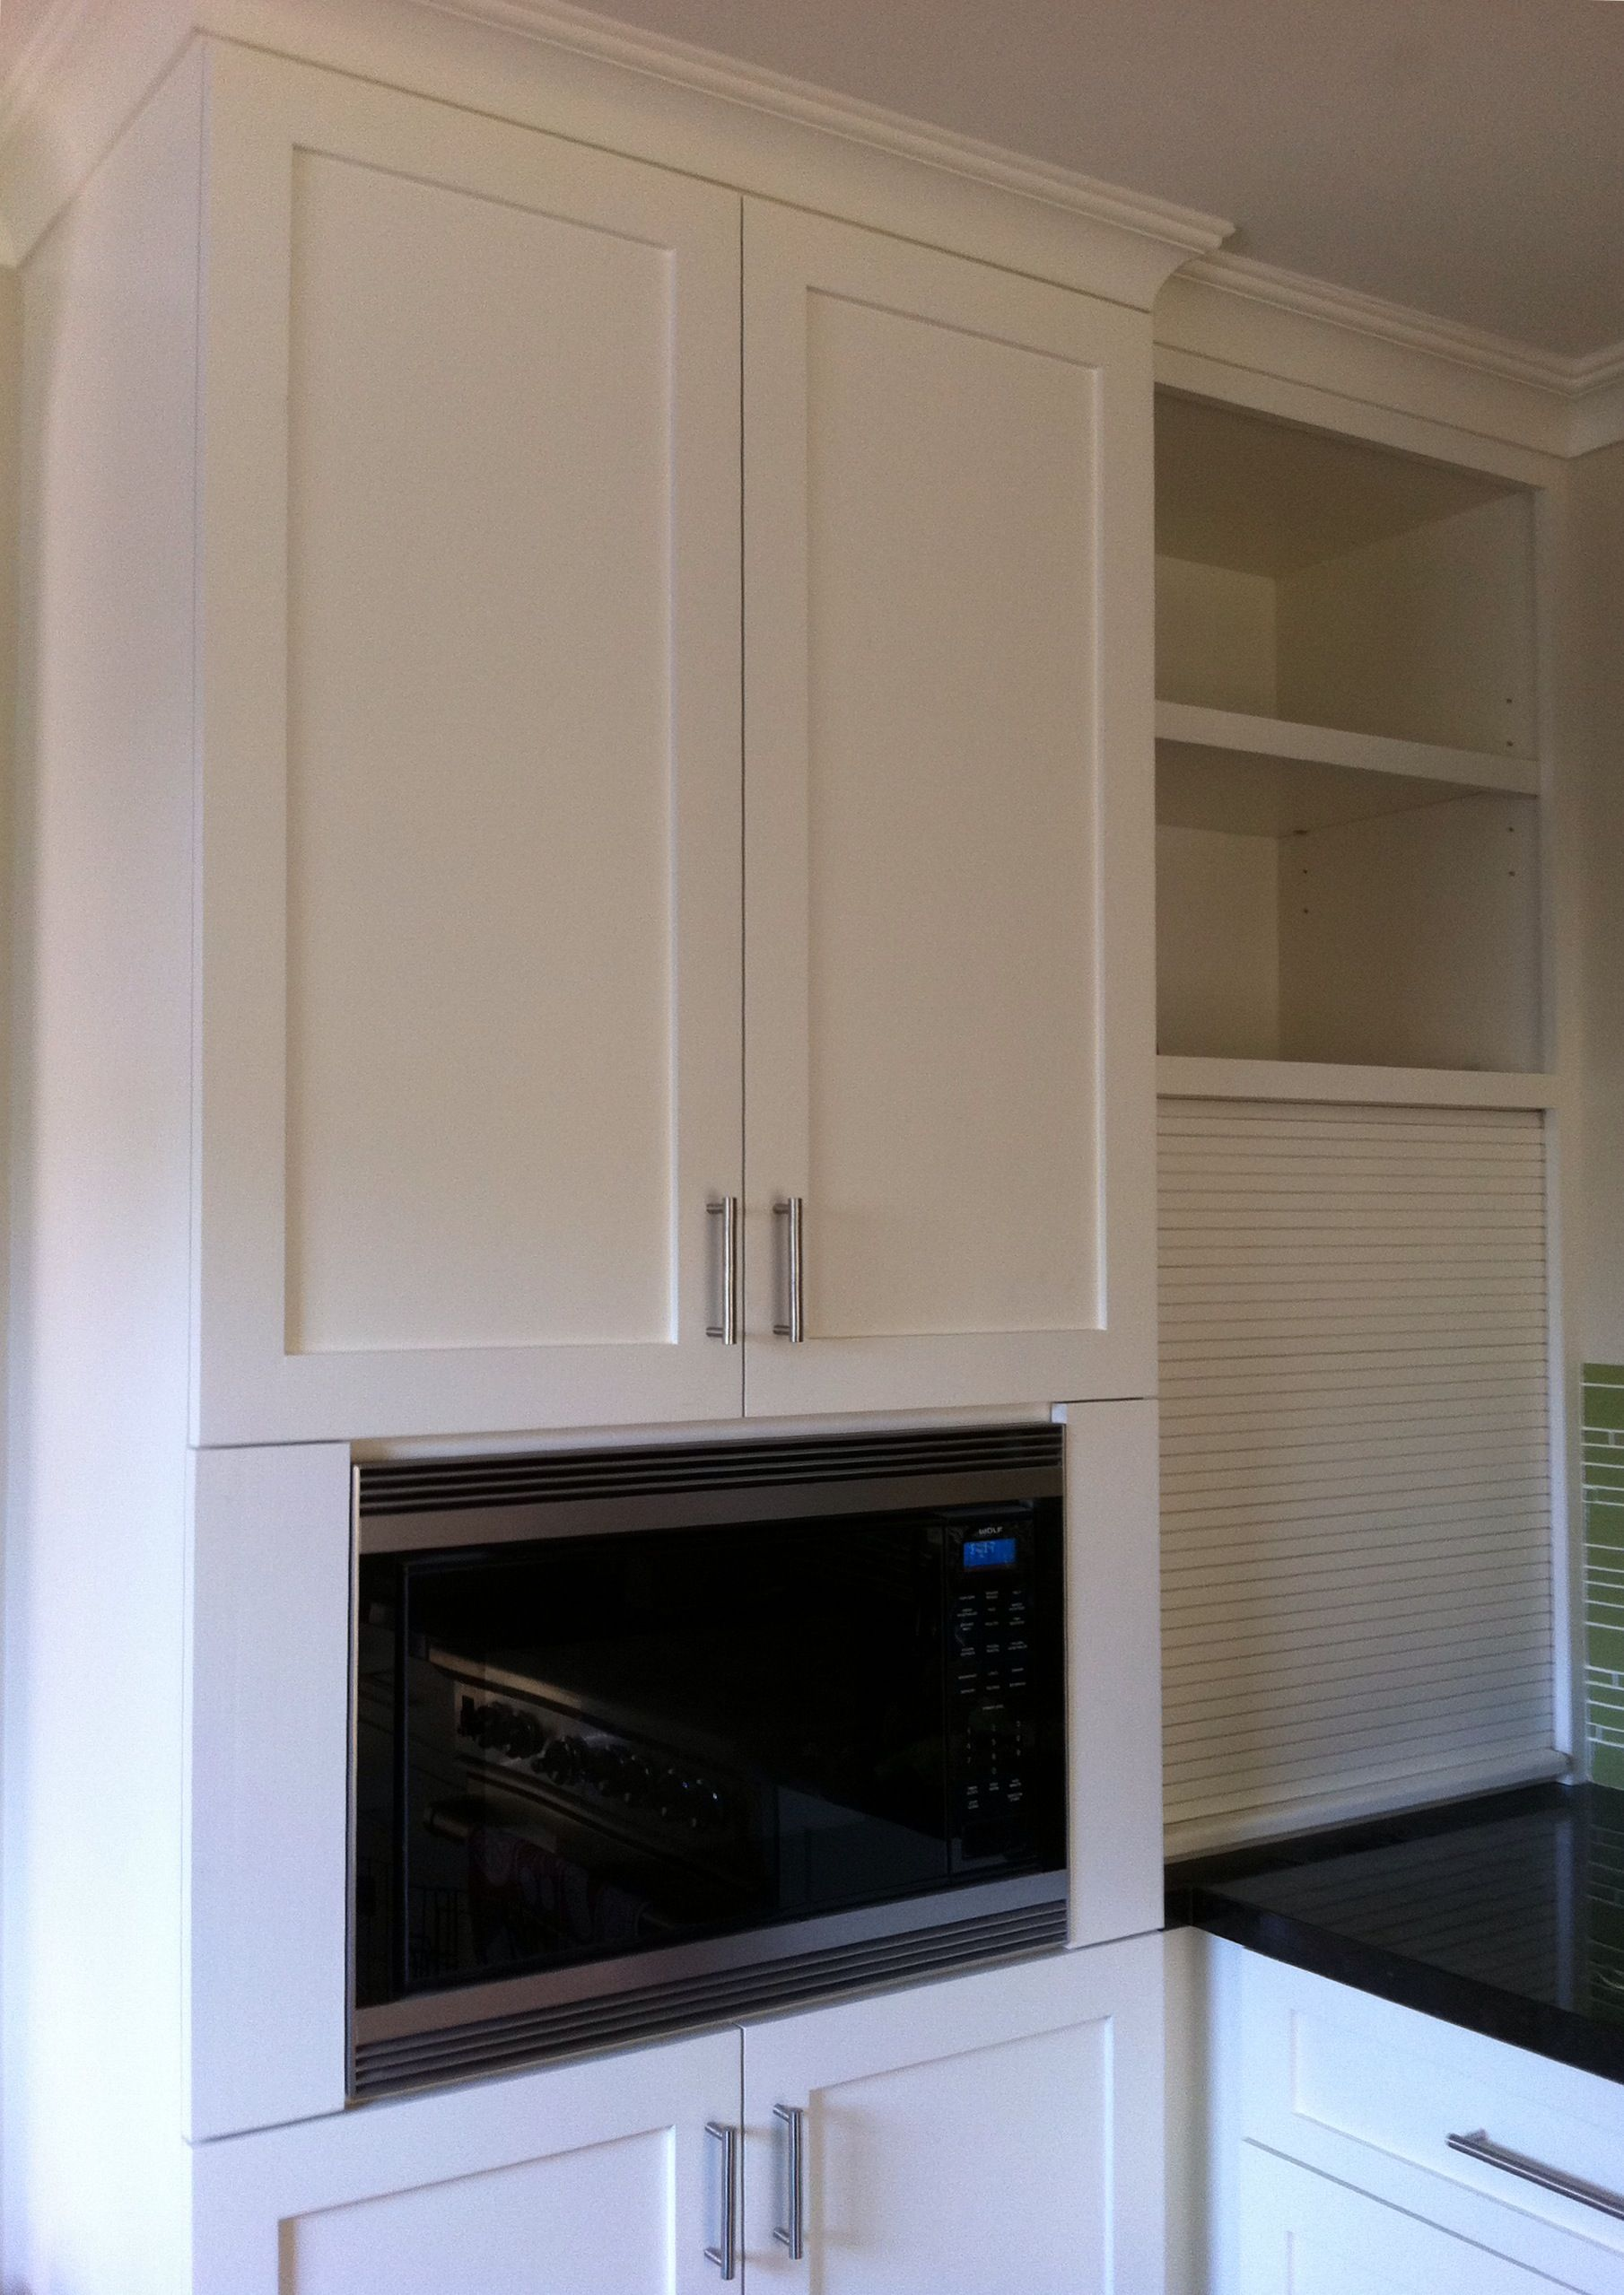 Pasadena Ca Residence Kitchen Remodel Latest Kitchen Ideas Interior Design Projects Kitchen Remodel